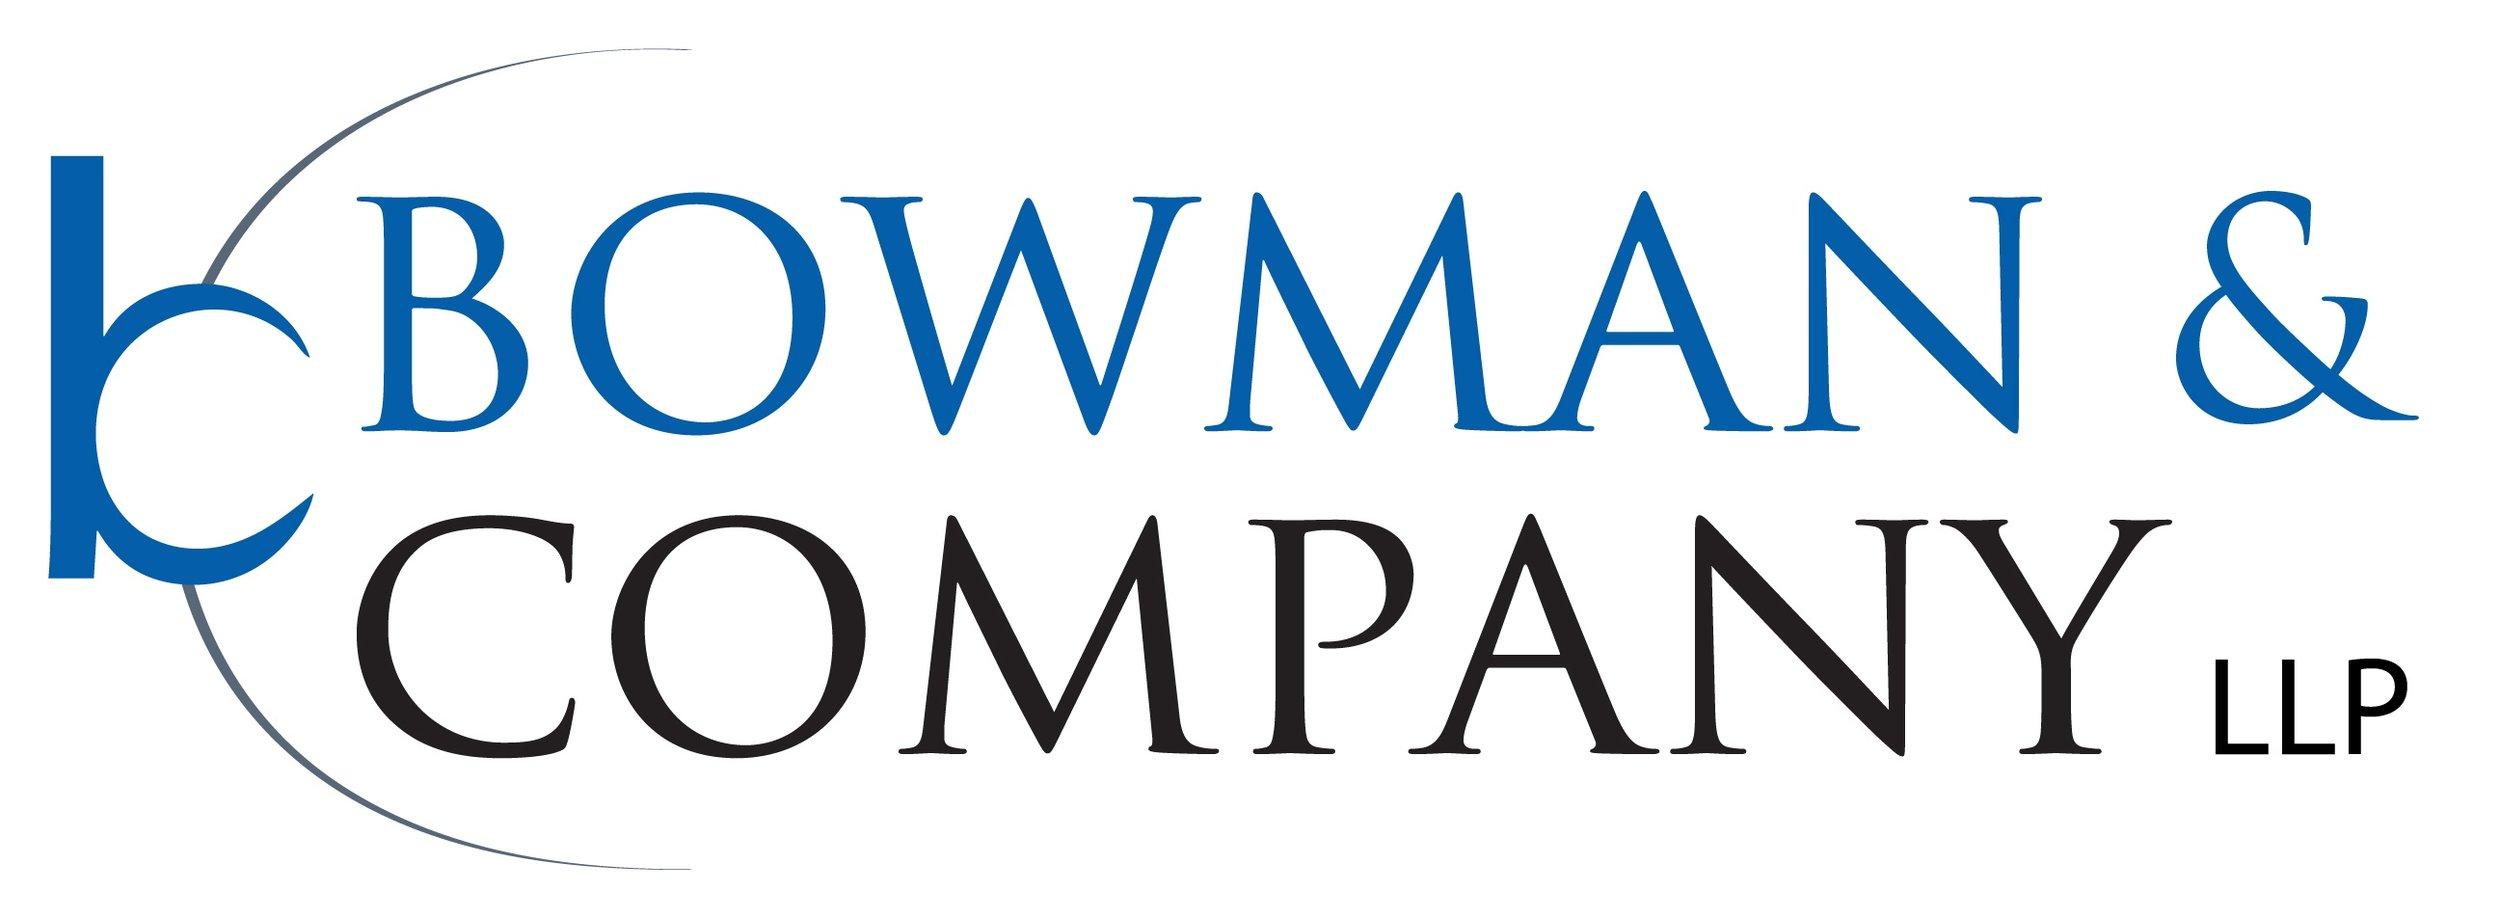 Bowman Logos - REVISED 2016_Compact.jpg